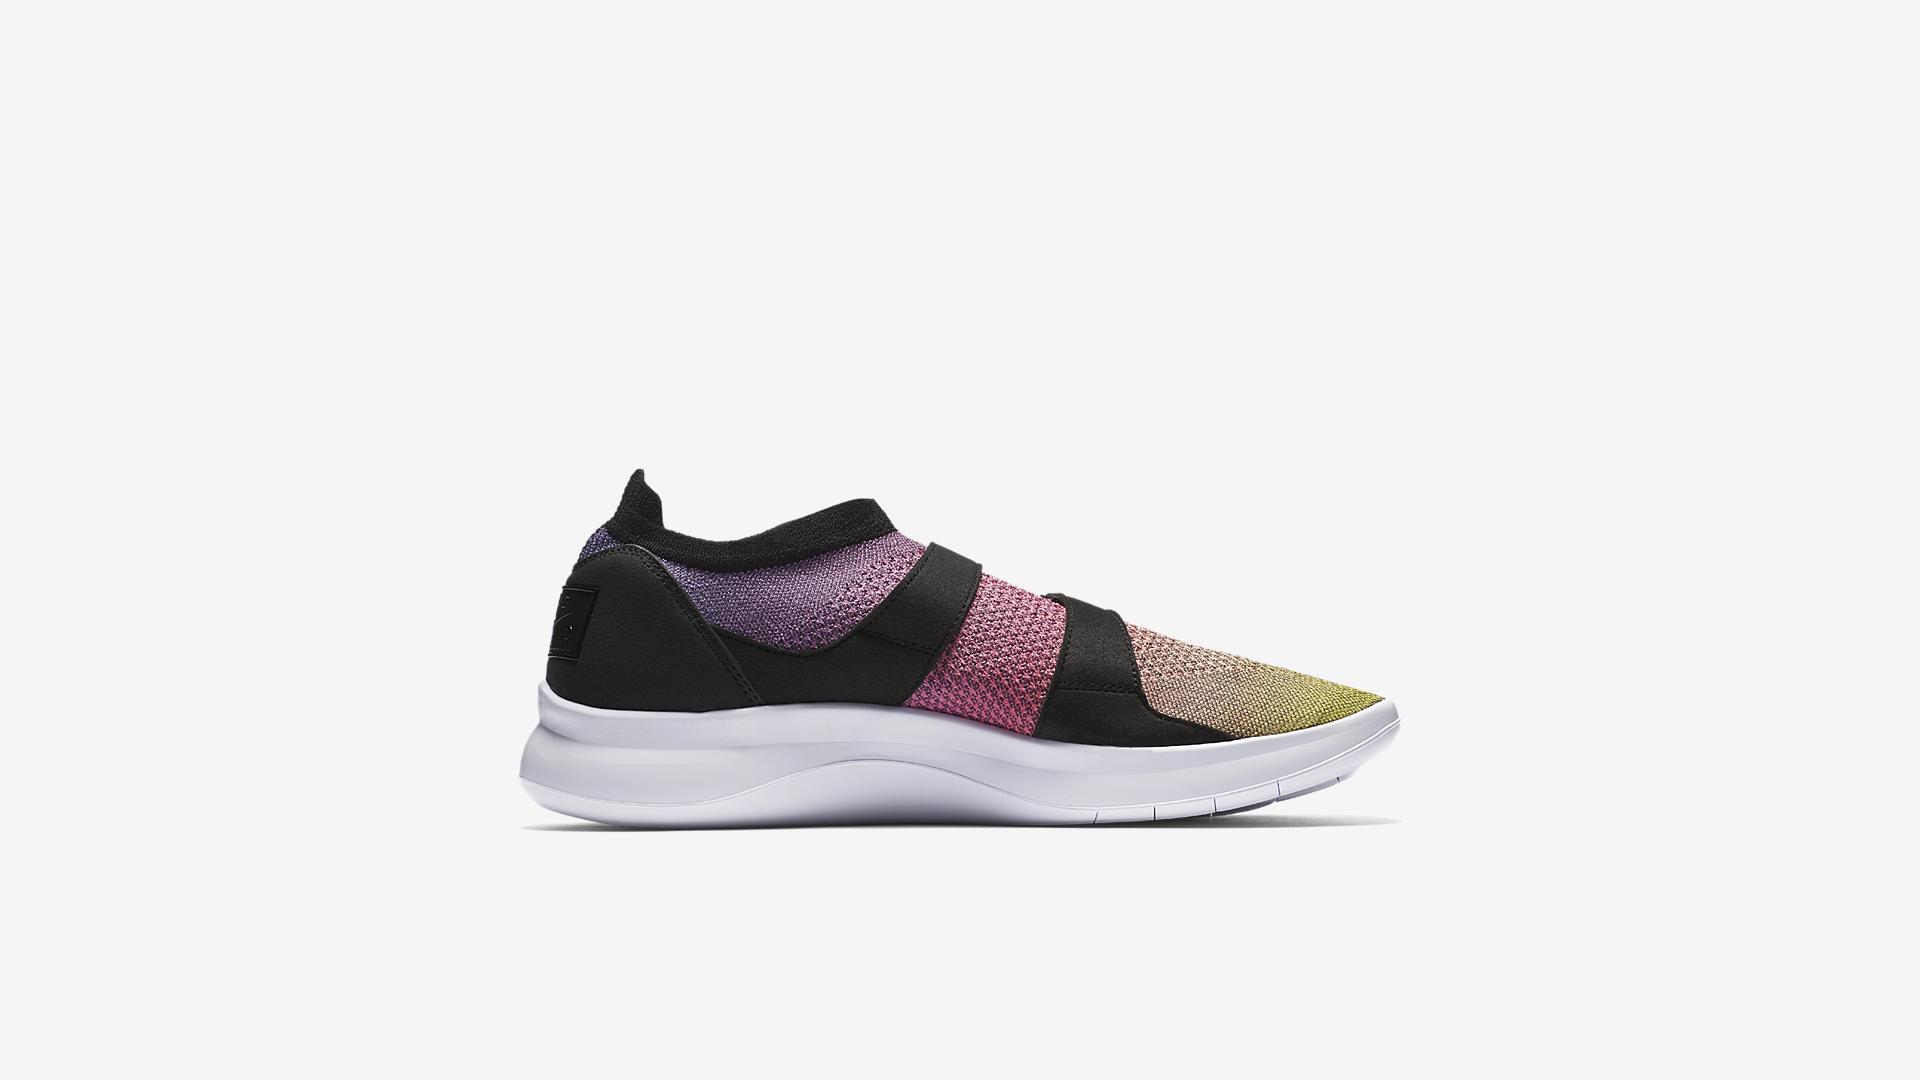 Nike Air Sock Racer Ultra Flyknit Premium Rainbow 898021 700 4